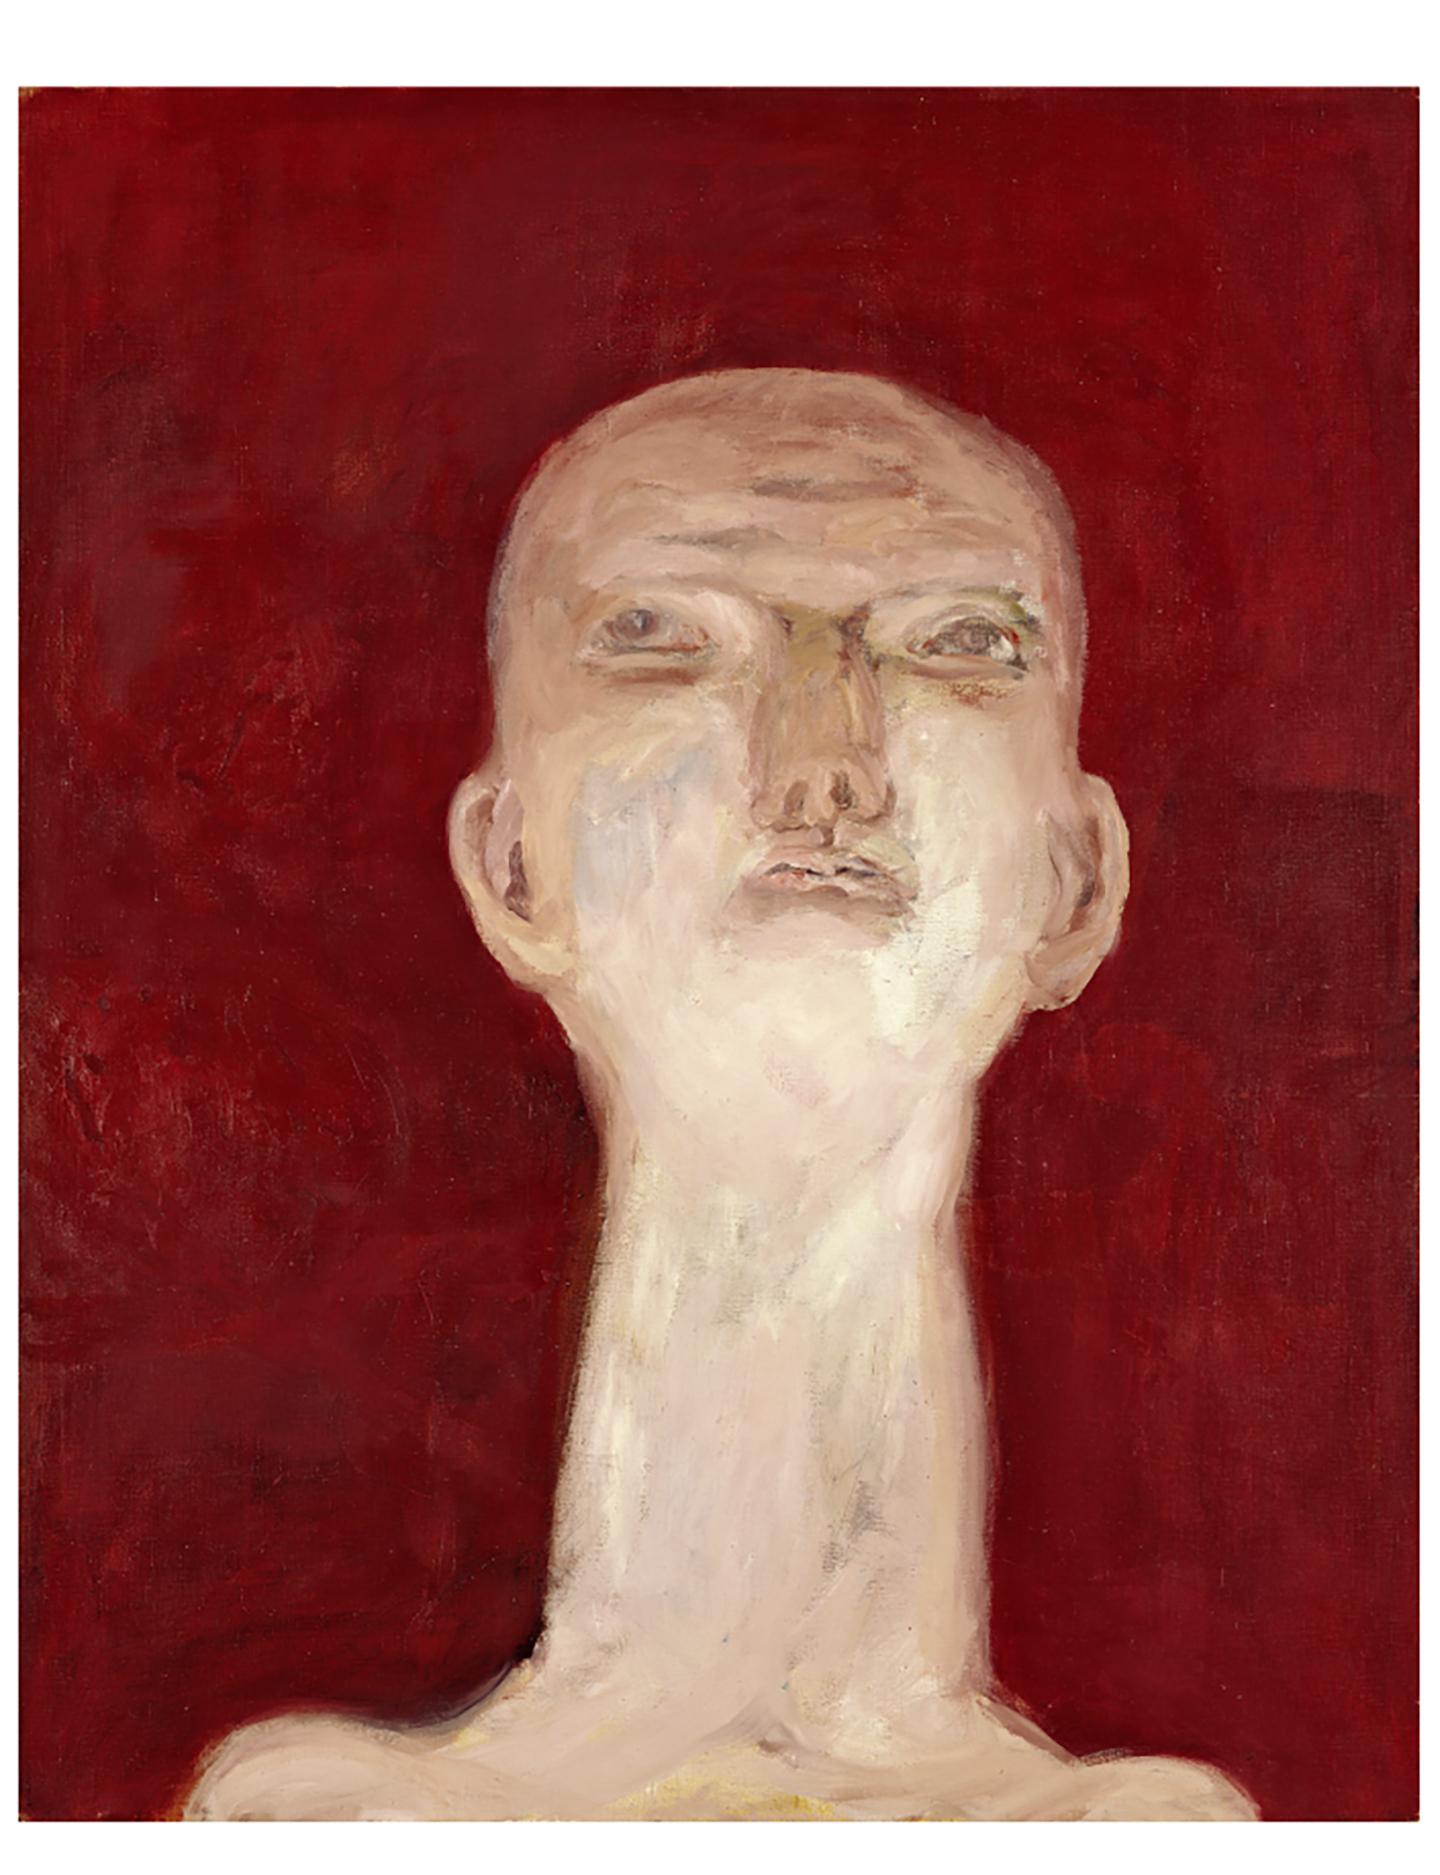 Georg Baselitz P.D. Idol, 1964